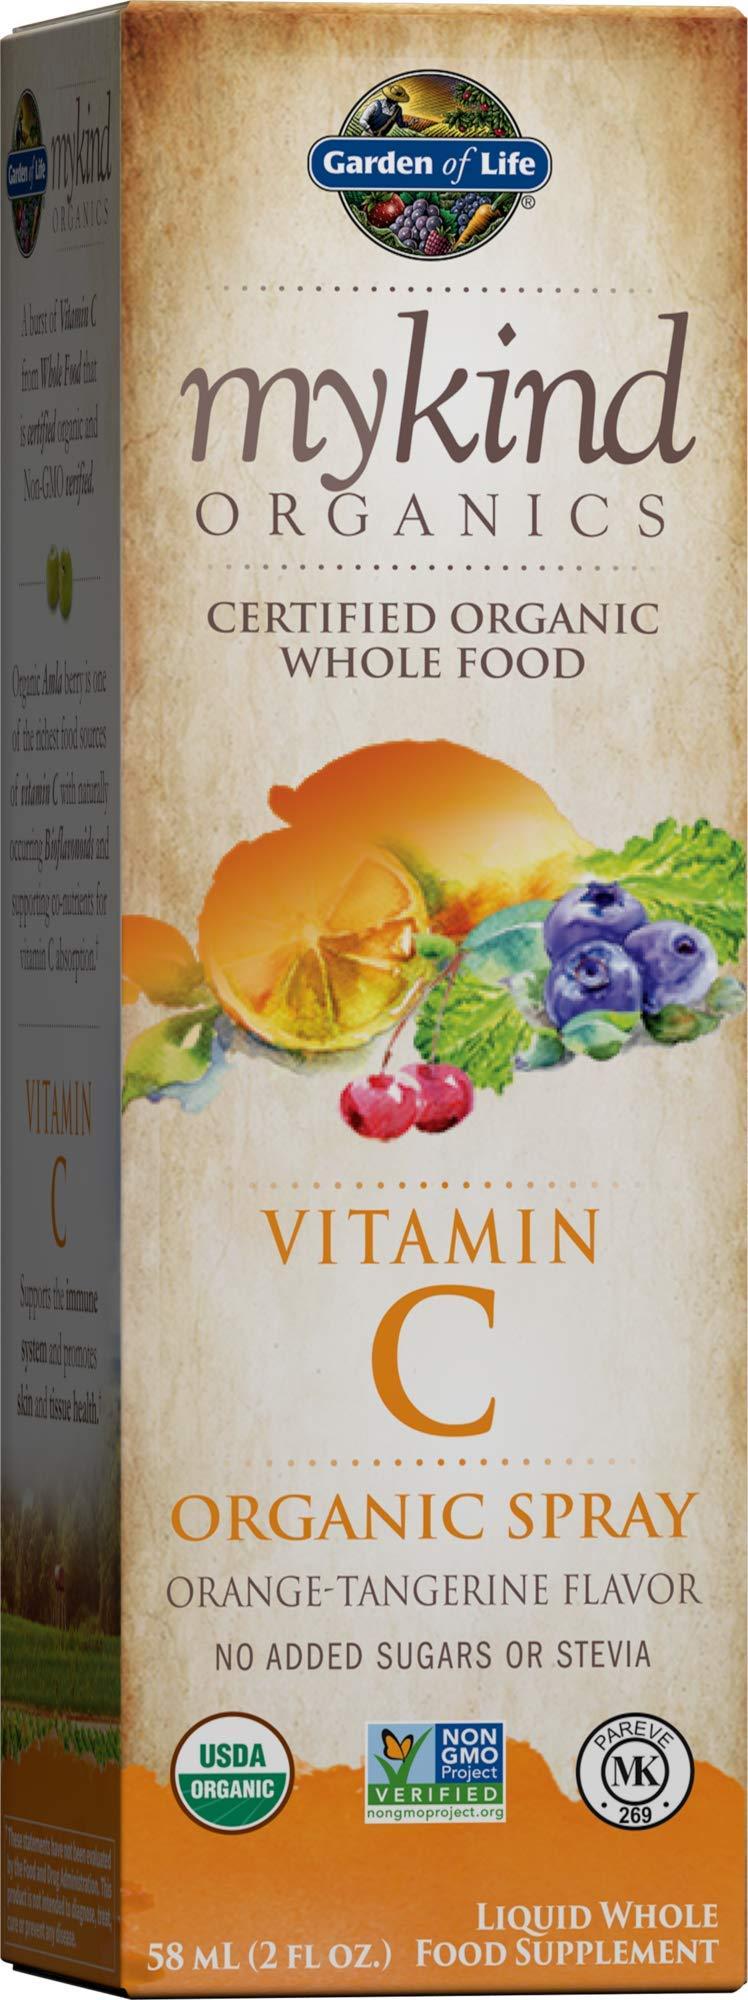 Garden of Life Vitamin C with Amla - mykind Organic Whole Food Supplement for Skin Health, Orange Tangerine Spray, 2oz Liquid